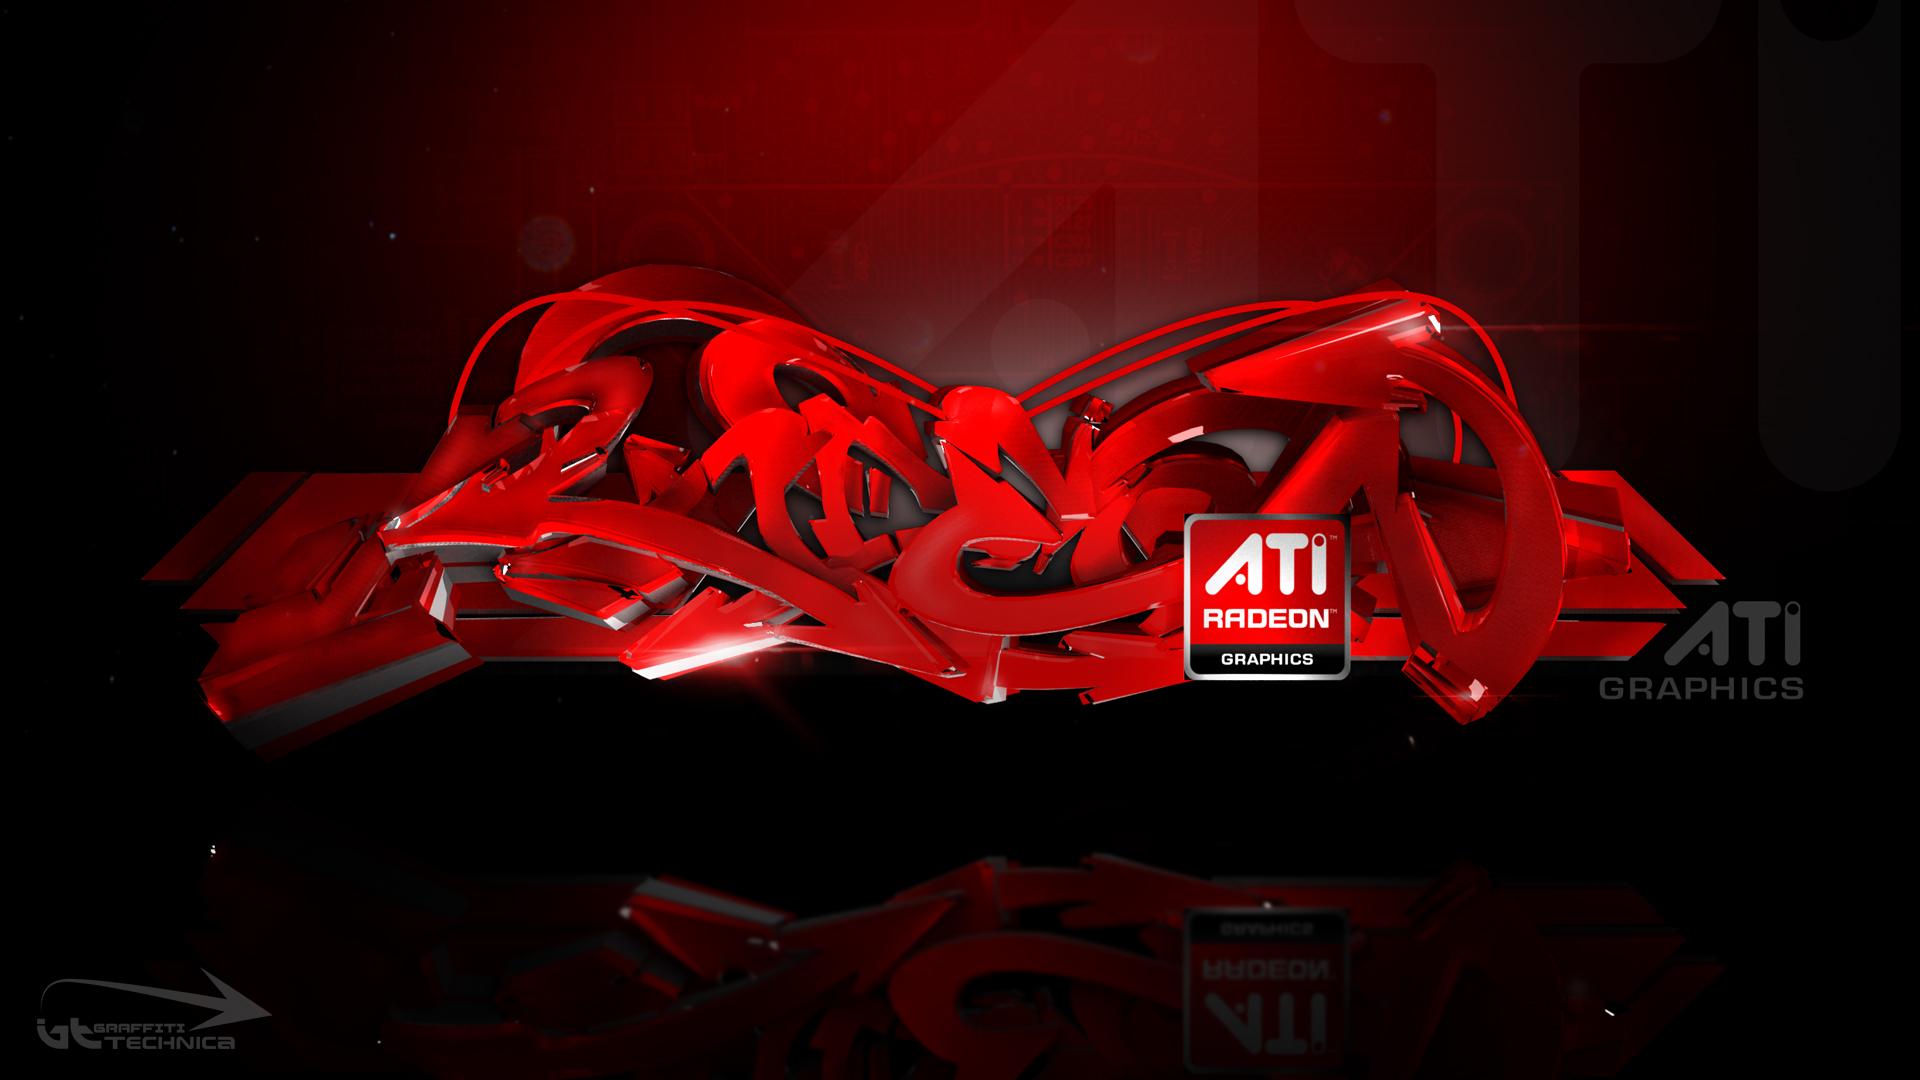 Asus pb287q monitor 2014 4k uhd wallpaper competition page 64 - Download Ati Radeon Wallpaper 1920x1080 Wallpoper 291140